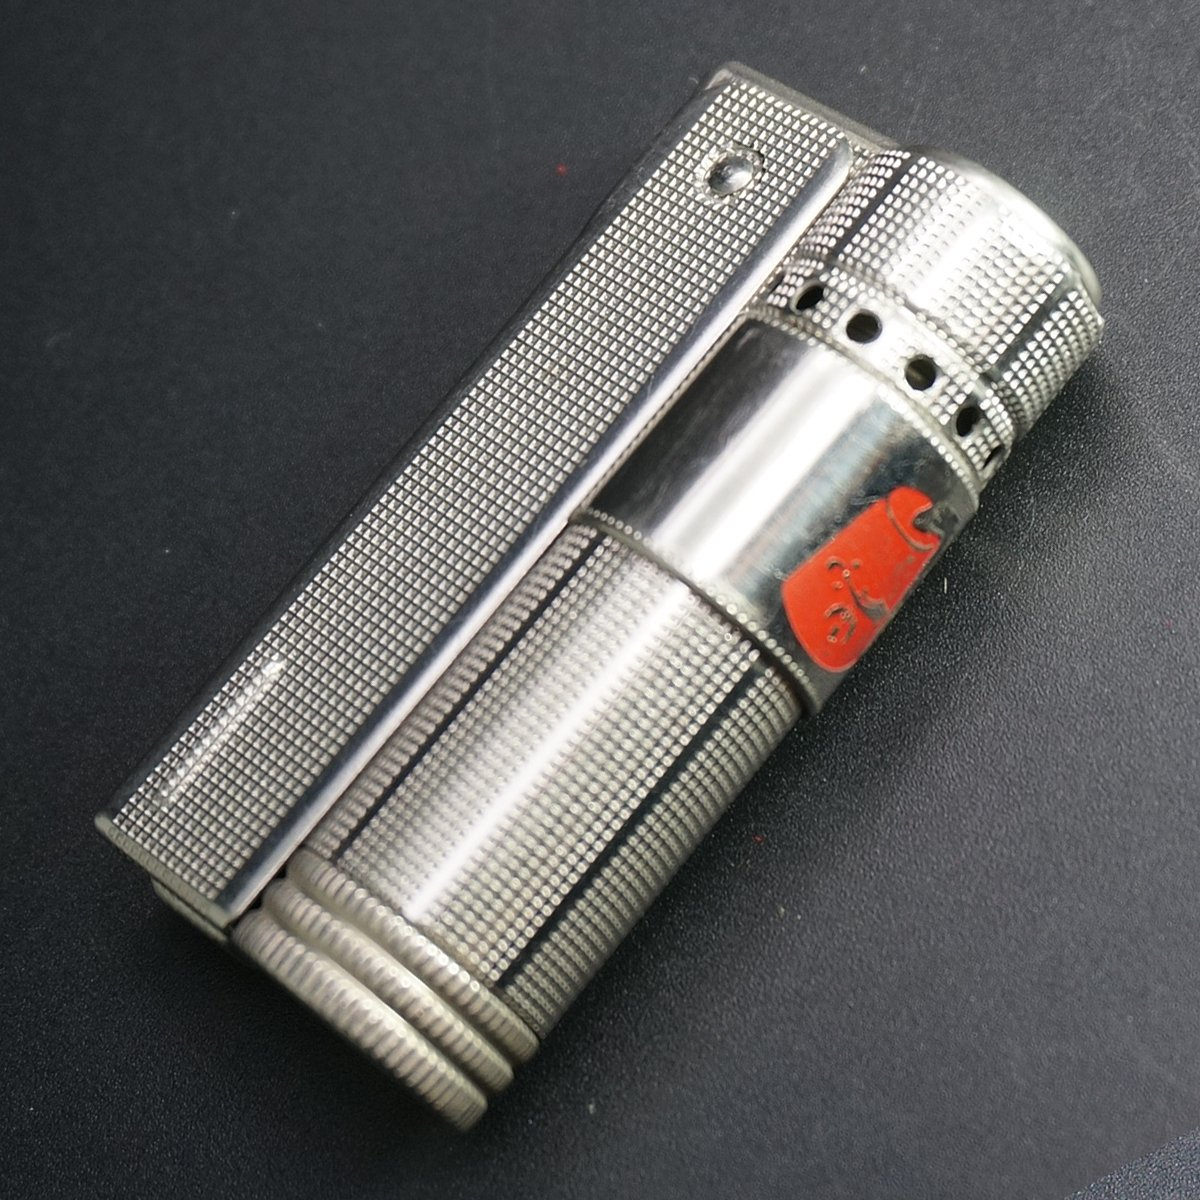 IMCO(イムコ)トリプレックススーパー サンプル品   B06XYKTYR7